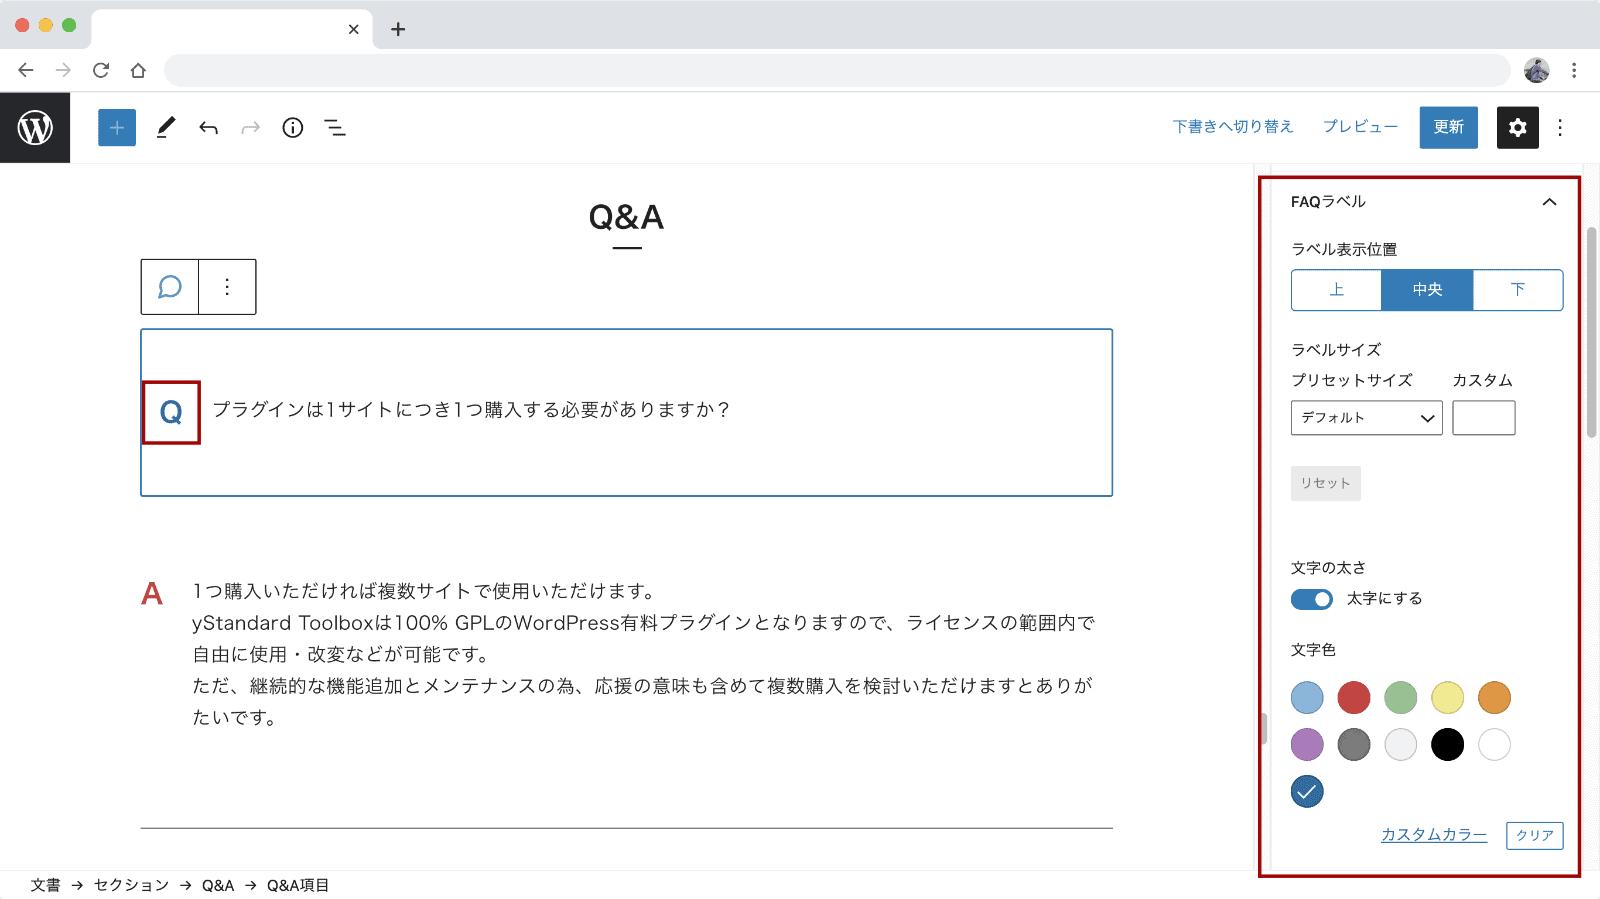 FAQラベルのデザイン設定